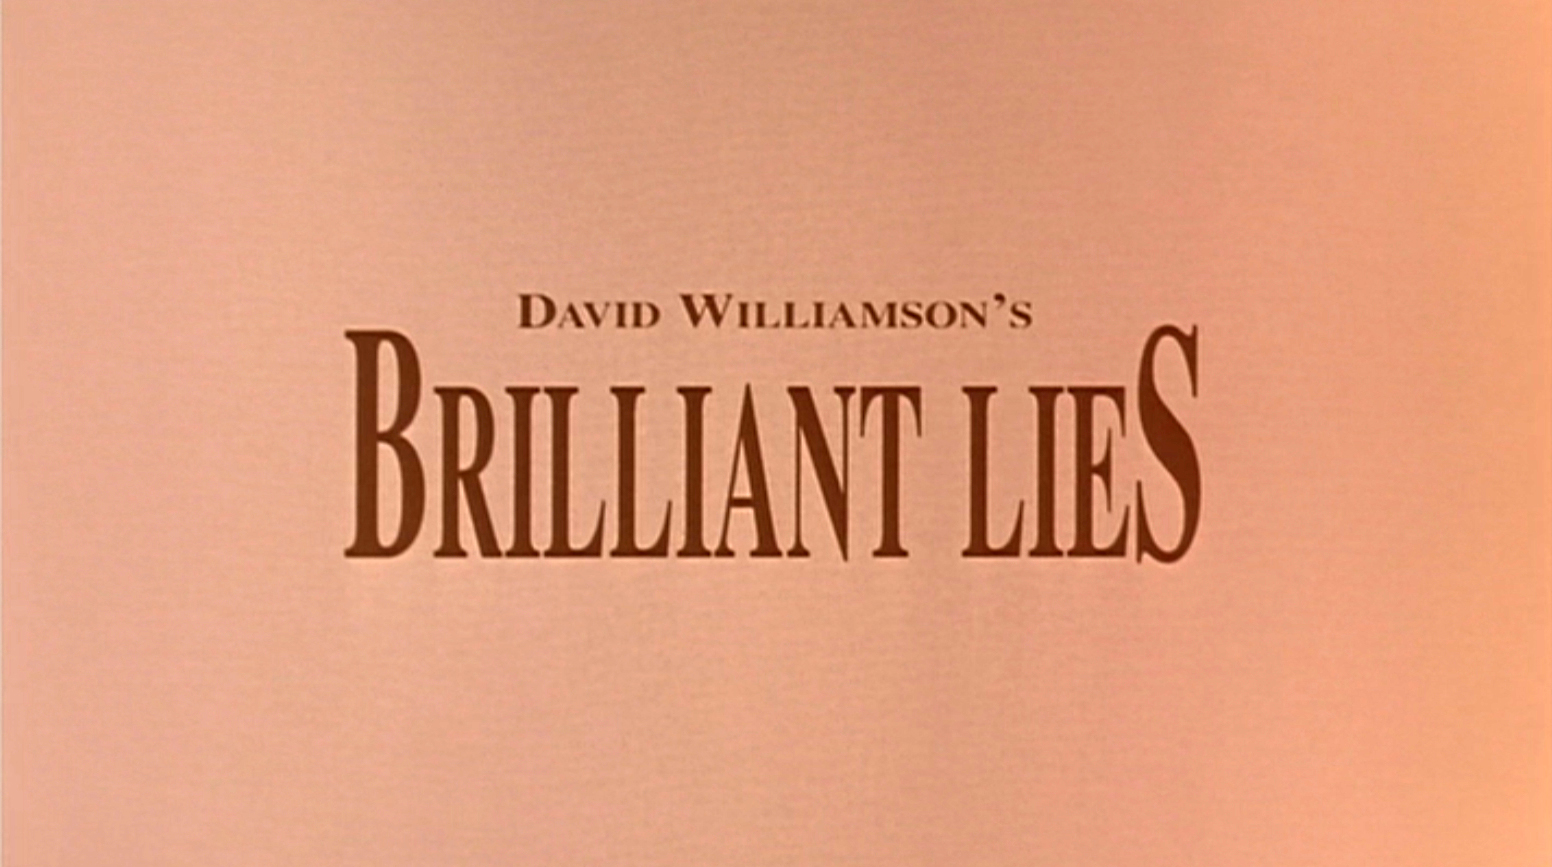 51c97d1d7c David Williamson s Brilliant Lies - Review - Photos - Ozmovies